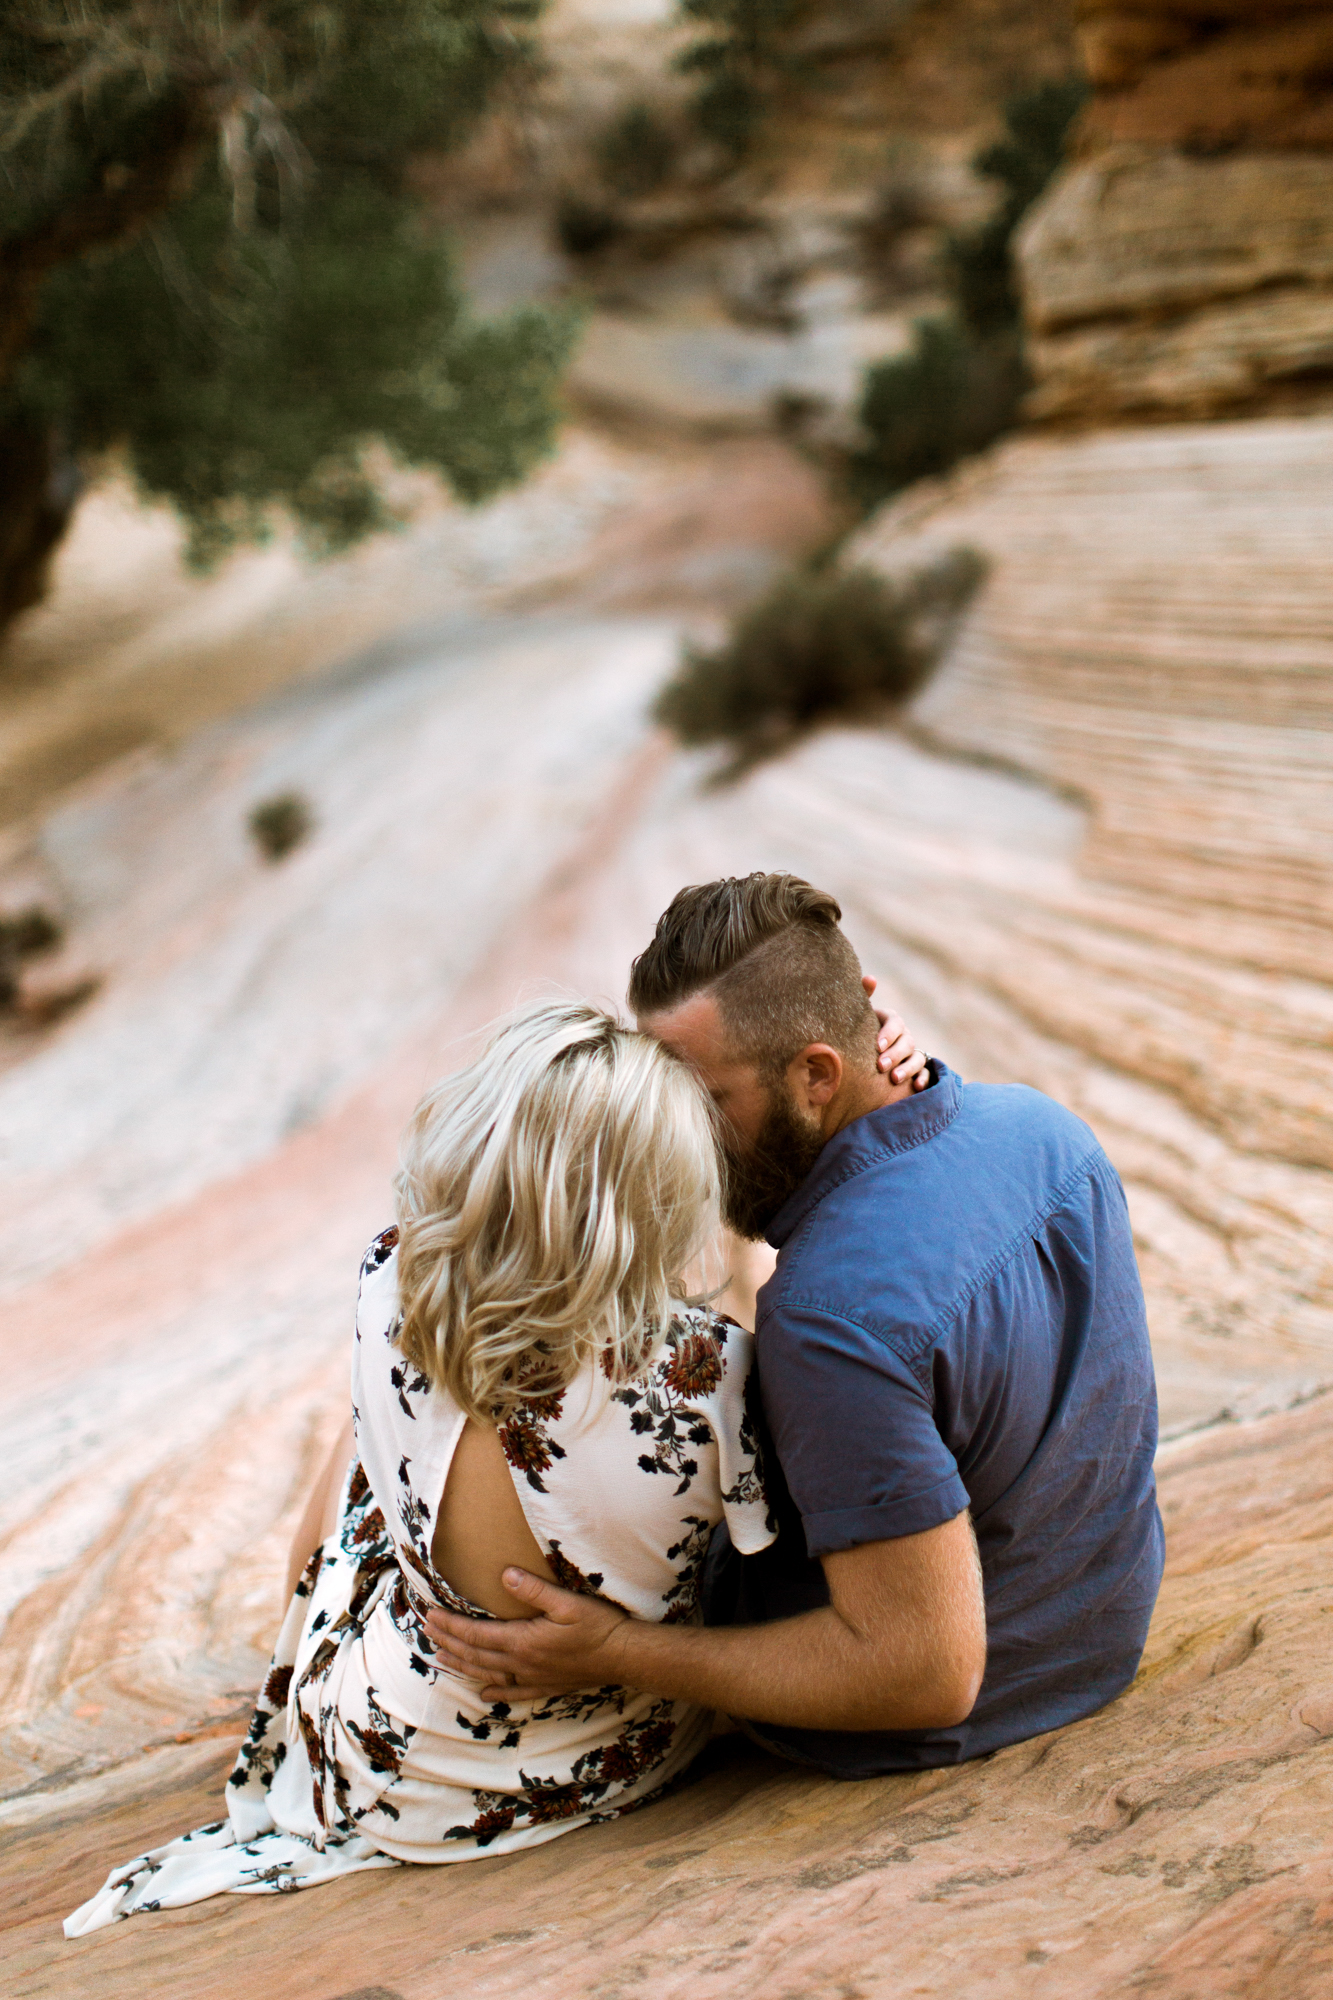 Zion National Park anniversary portrait session // adventure wedding photographer // www.abbihearne.com